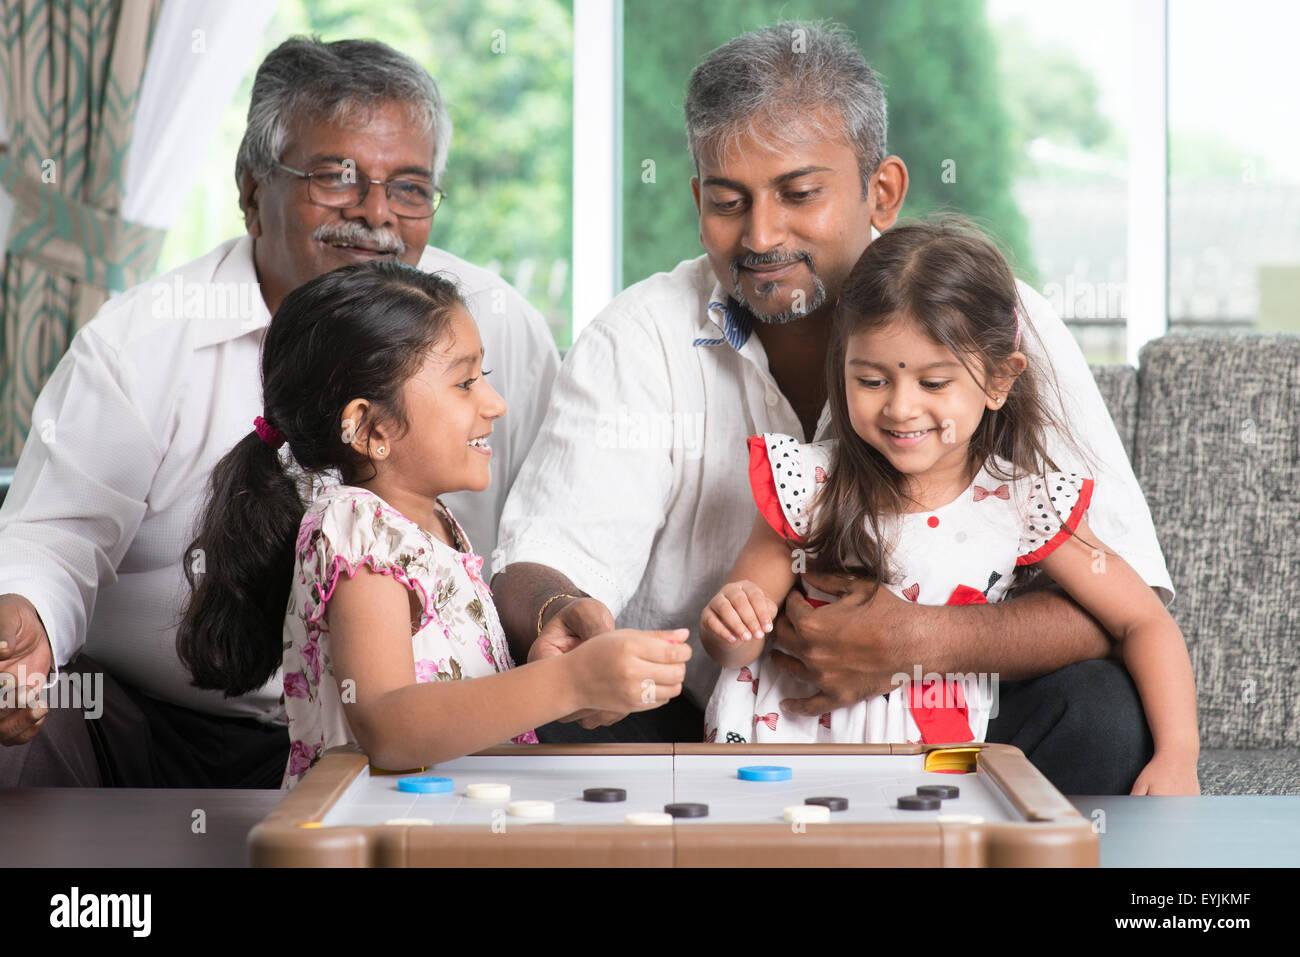 Feliz De Multiples Generaciones De La Familia India Asia Jugar Carom